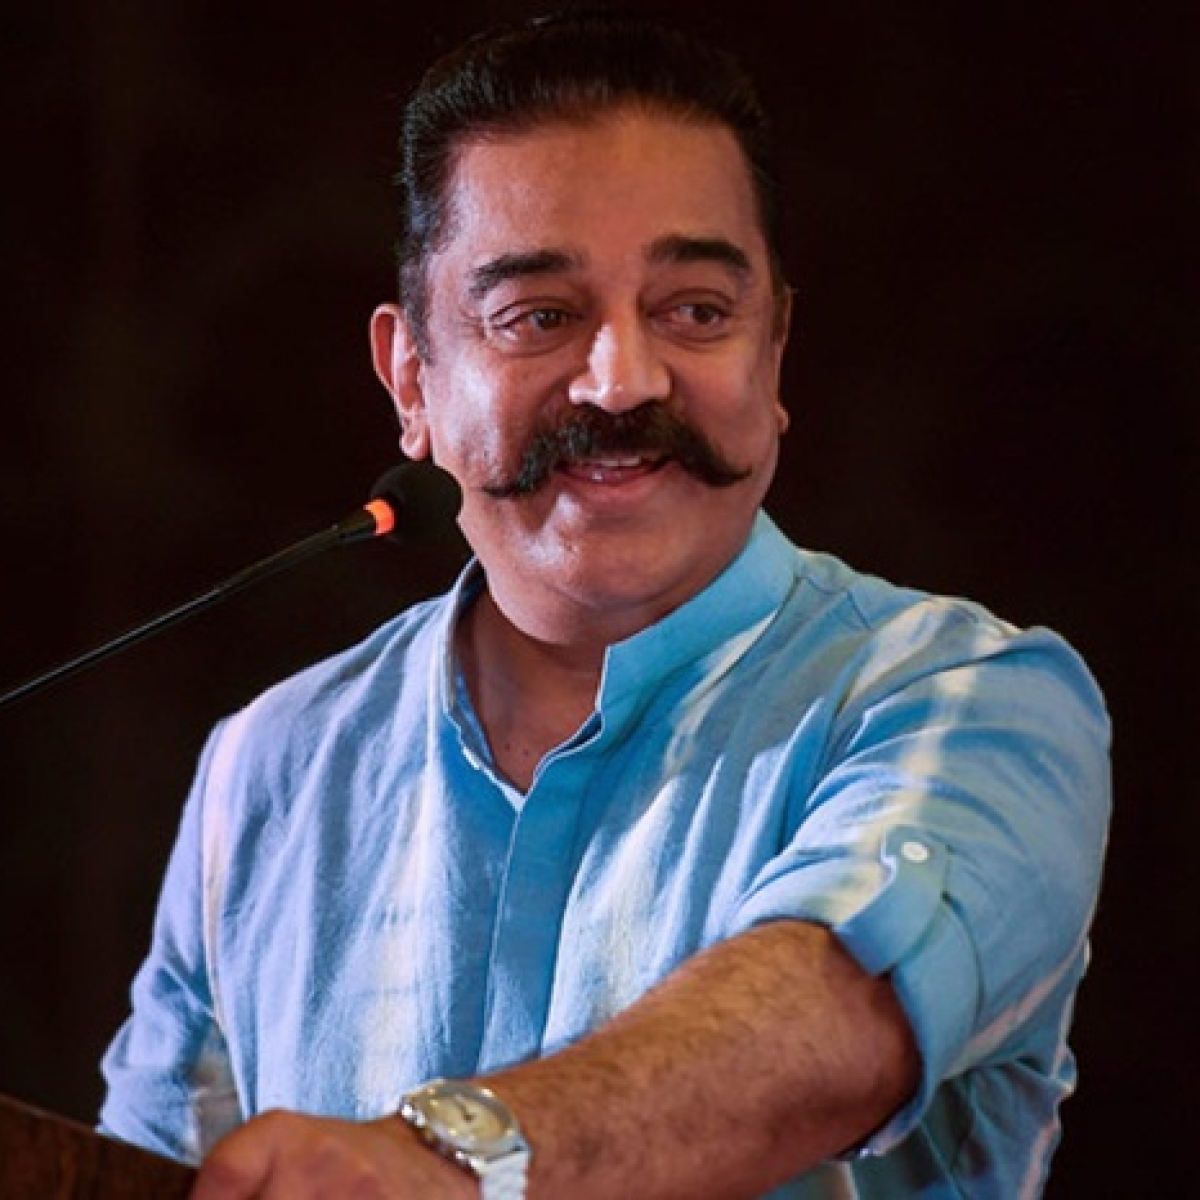 Expenditure on Kudankulam project more than production: Kamal Haasan